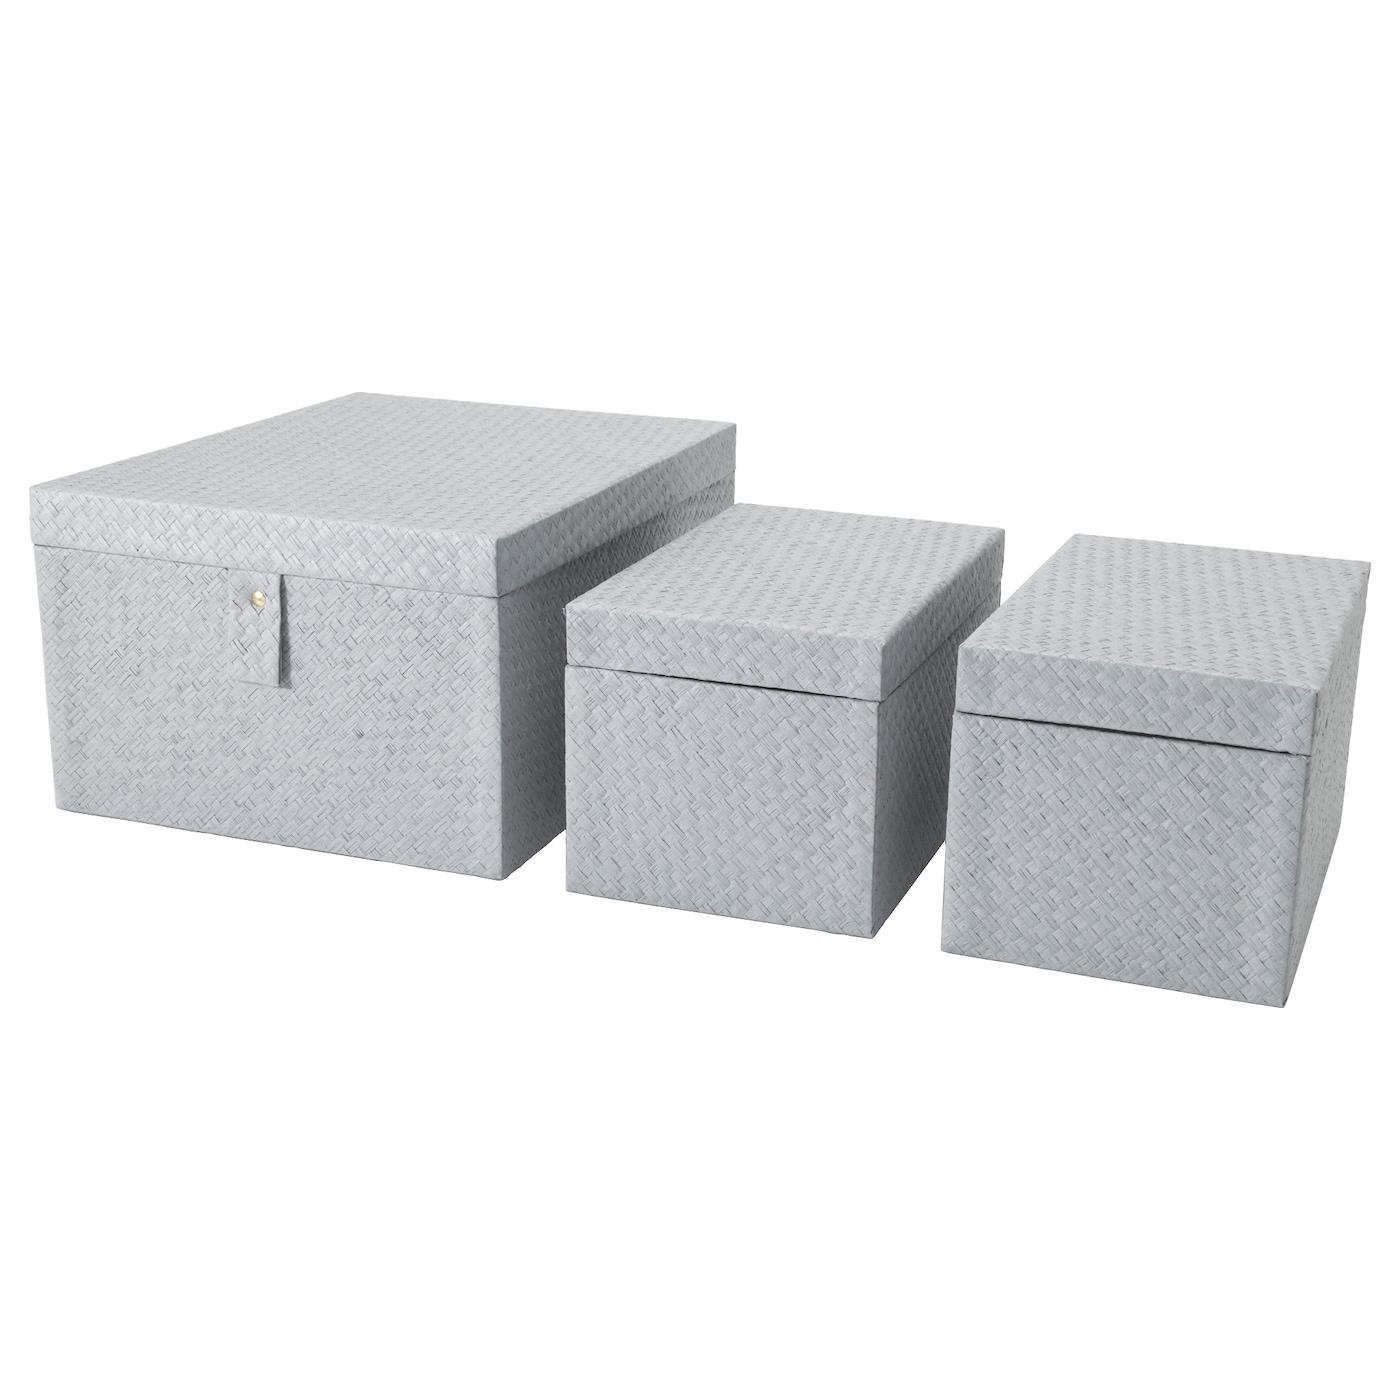 batting bo te 3 pi ces gris ikea. Black Bedroom Furniture Sets. Home Design Ideas